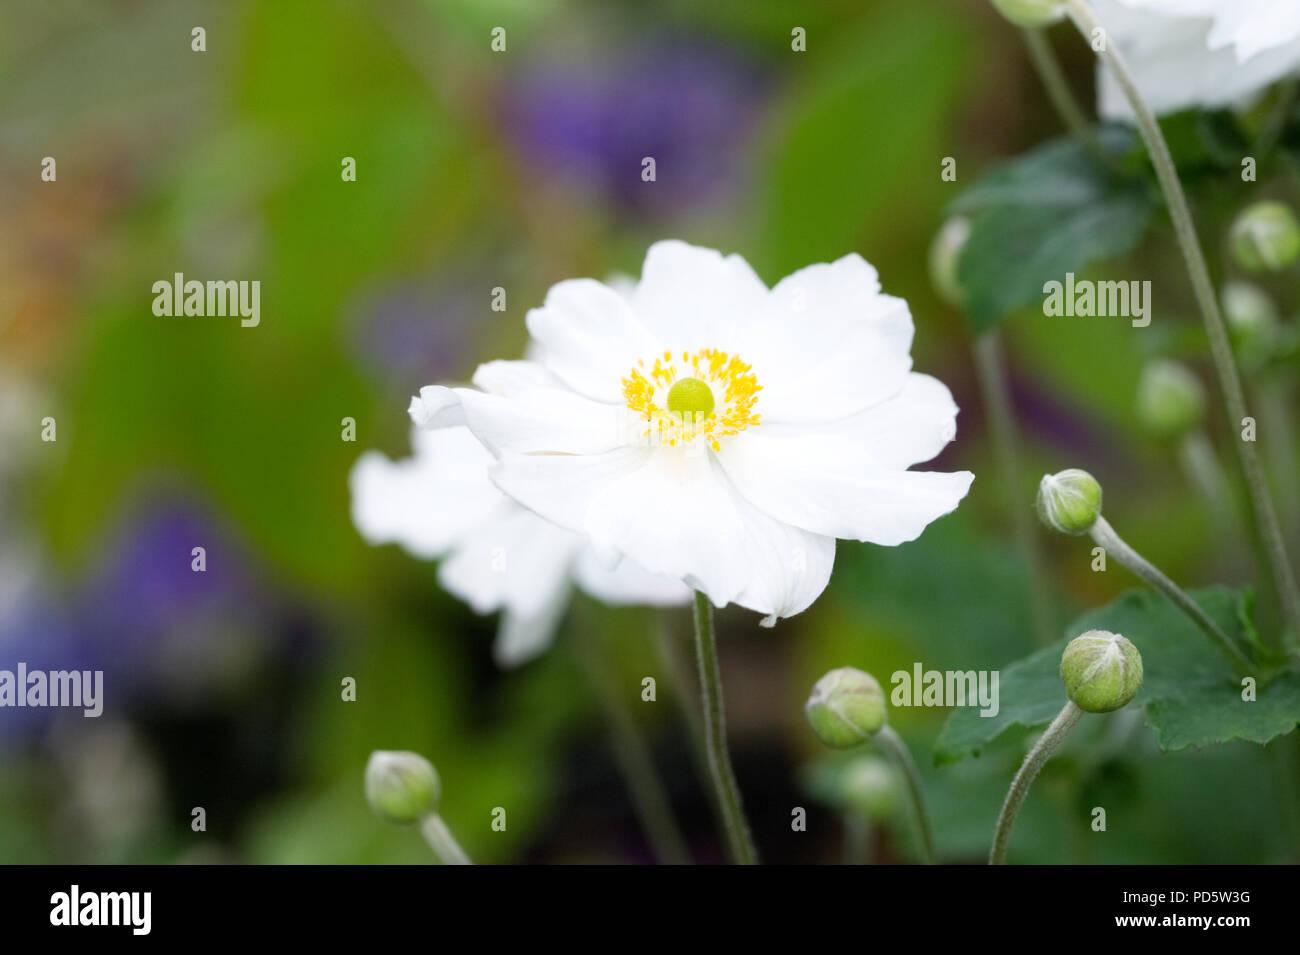 Anemone hupehensis var. japonica. Japanese anemone flower. Stock Photo